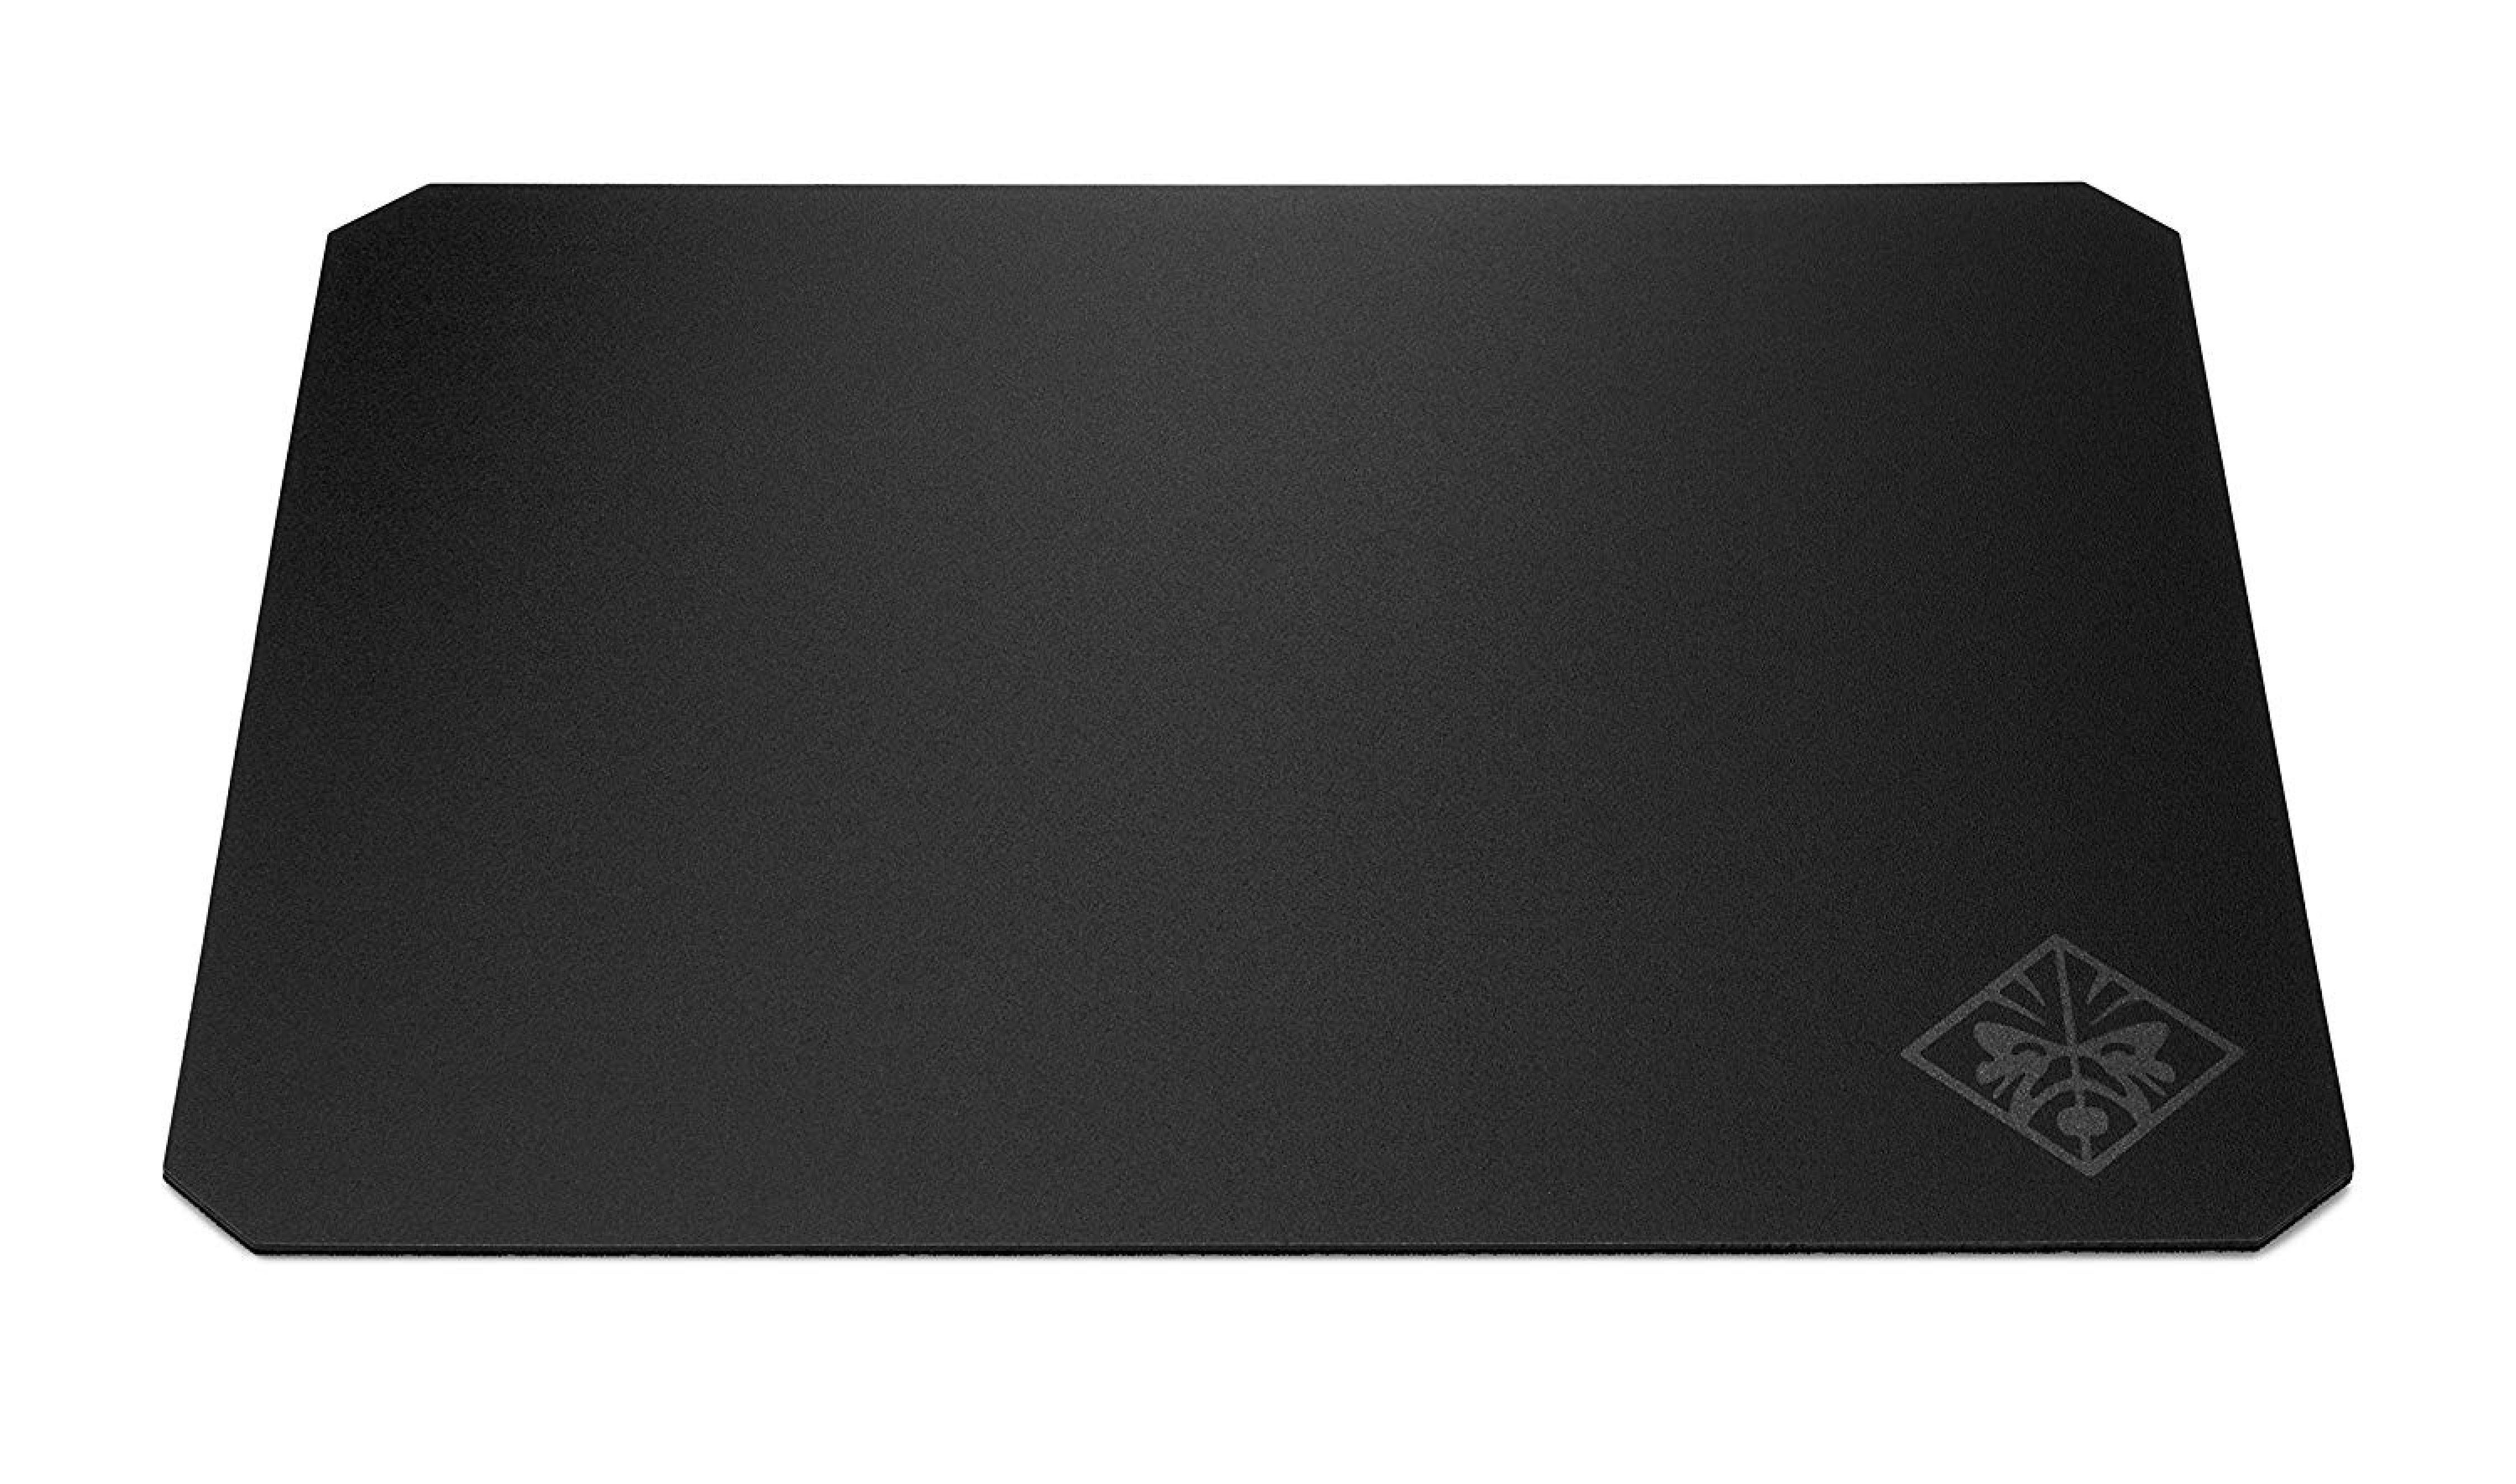 HP OMEN Hard Mouse Pad 200 Europe Gaming-Mauspad »reibungsarme und strapazierfähige Oberfläche«